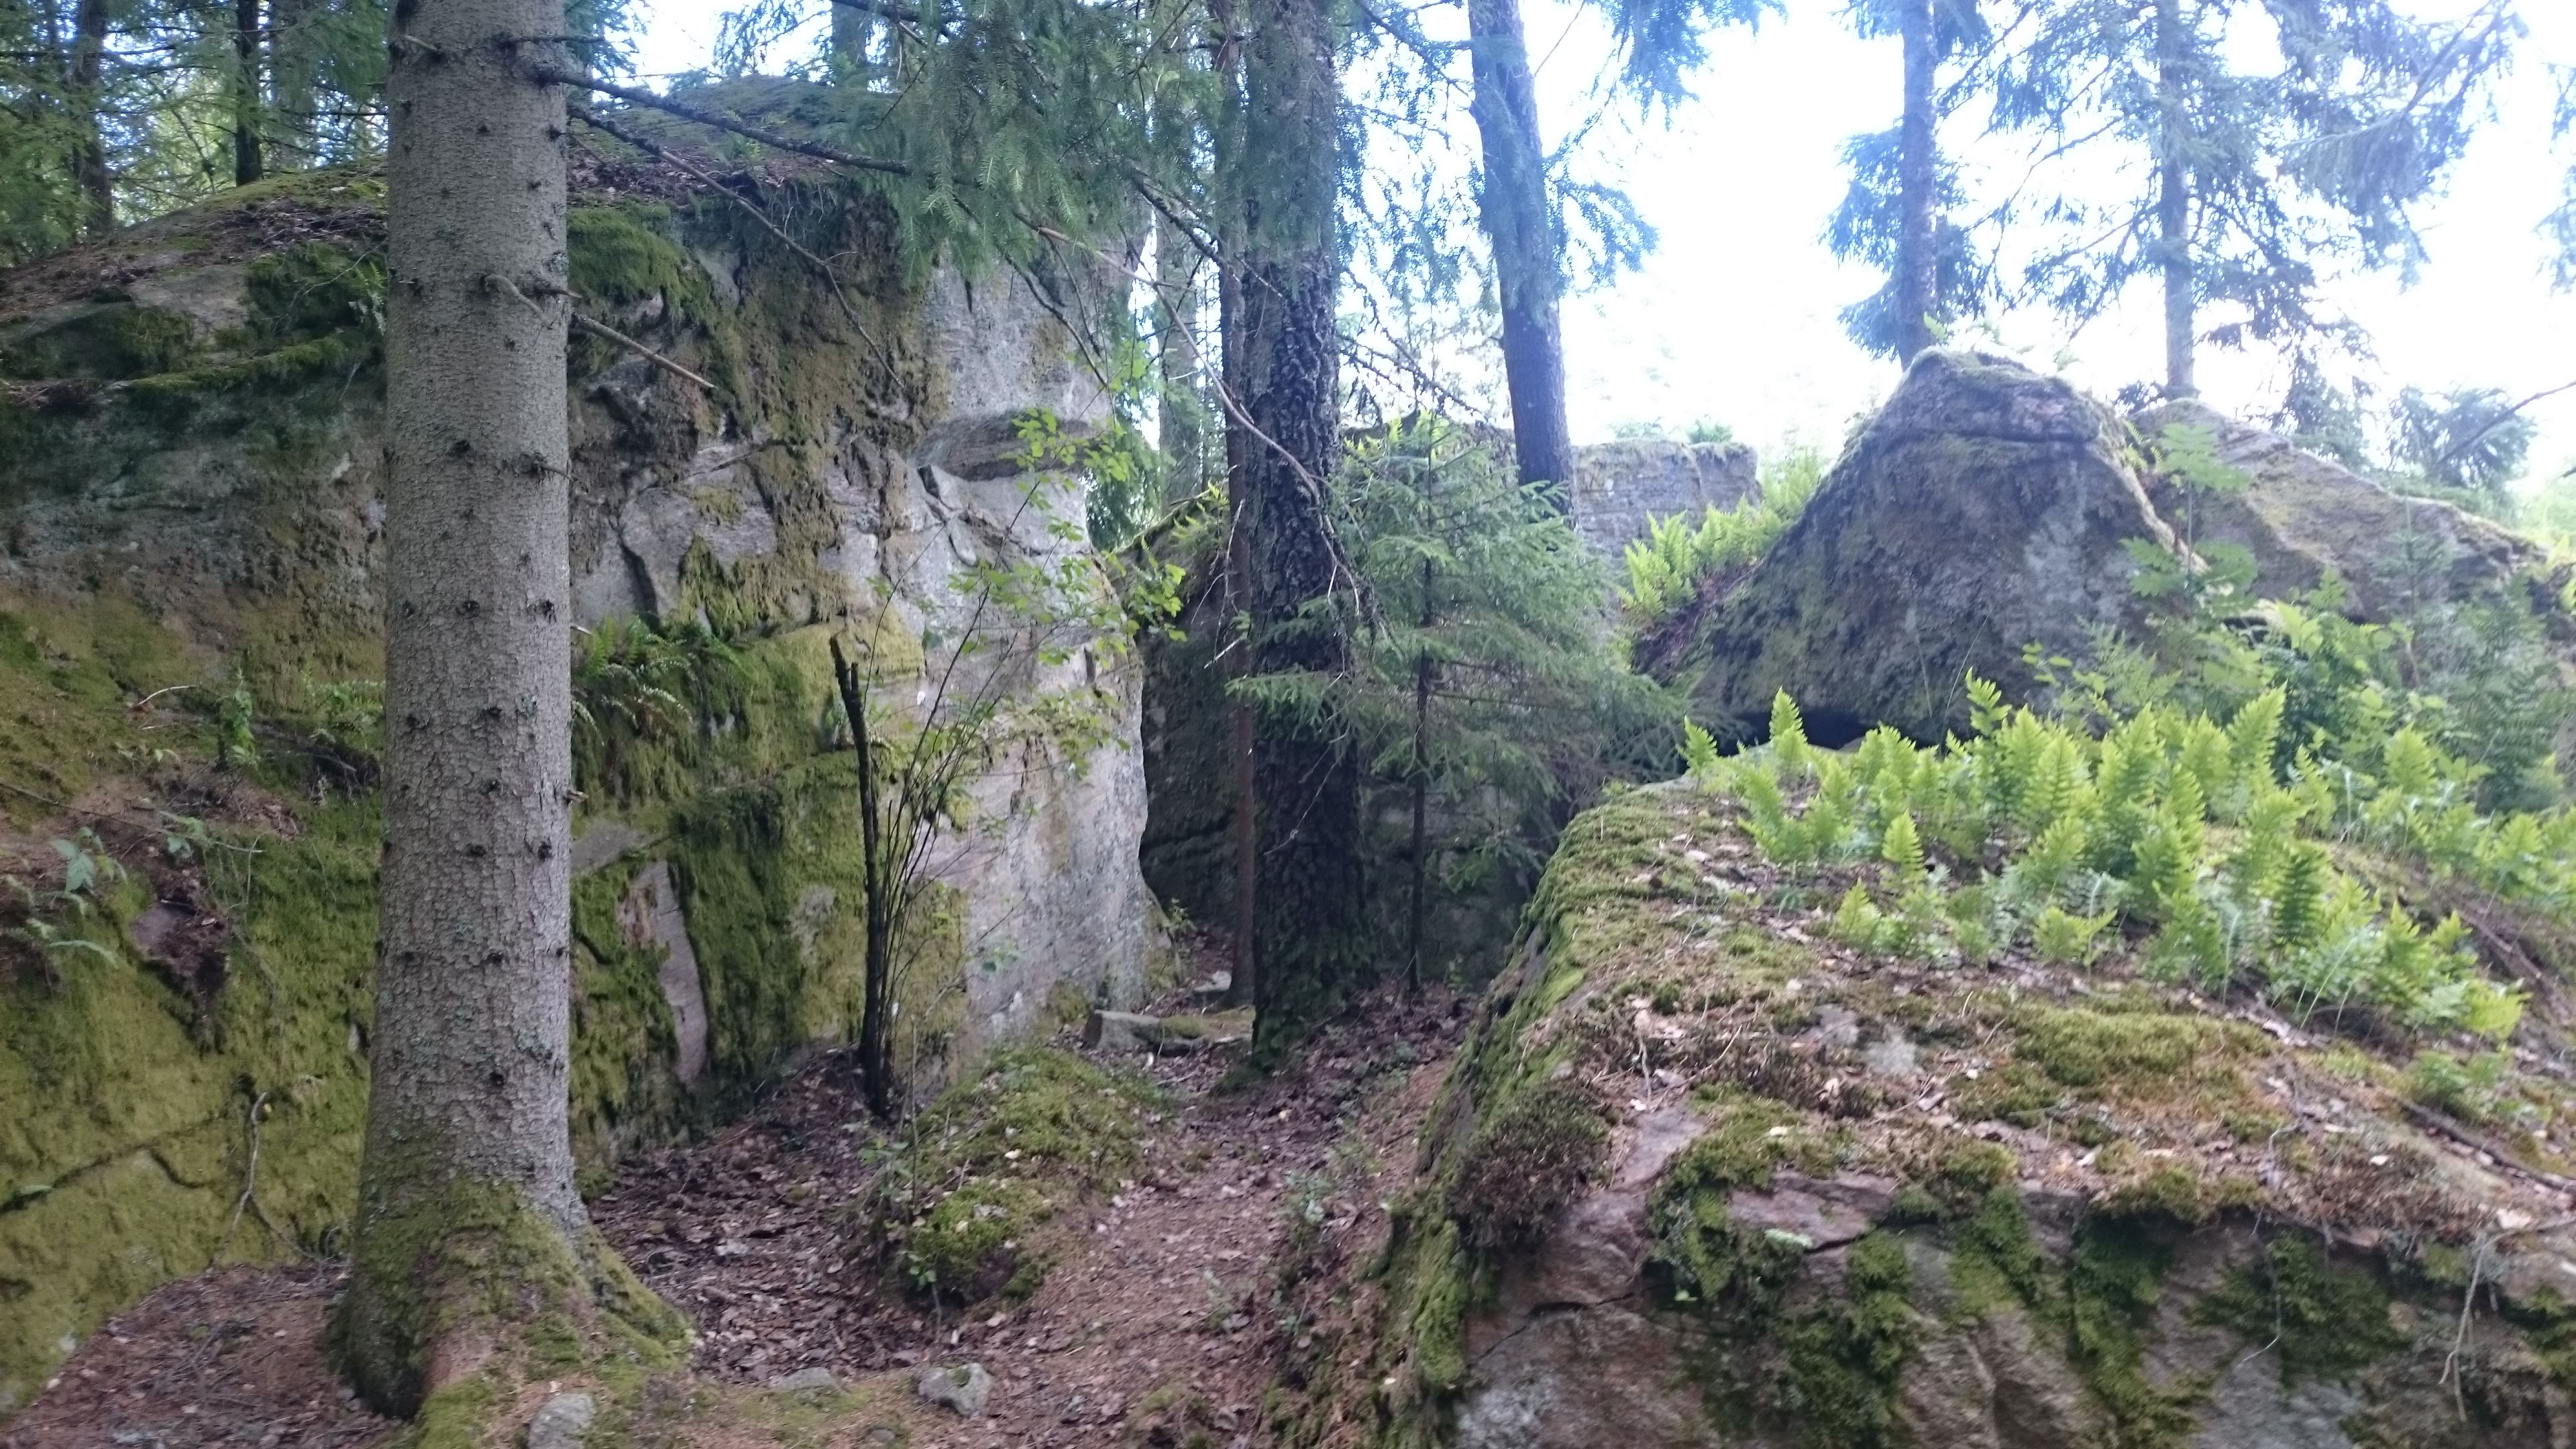 Tullberg's cave